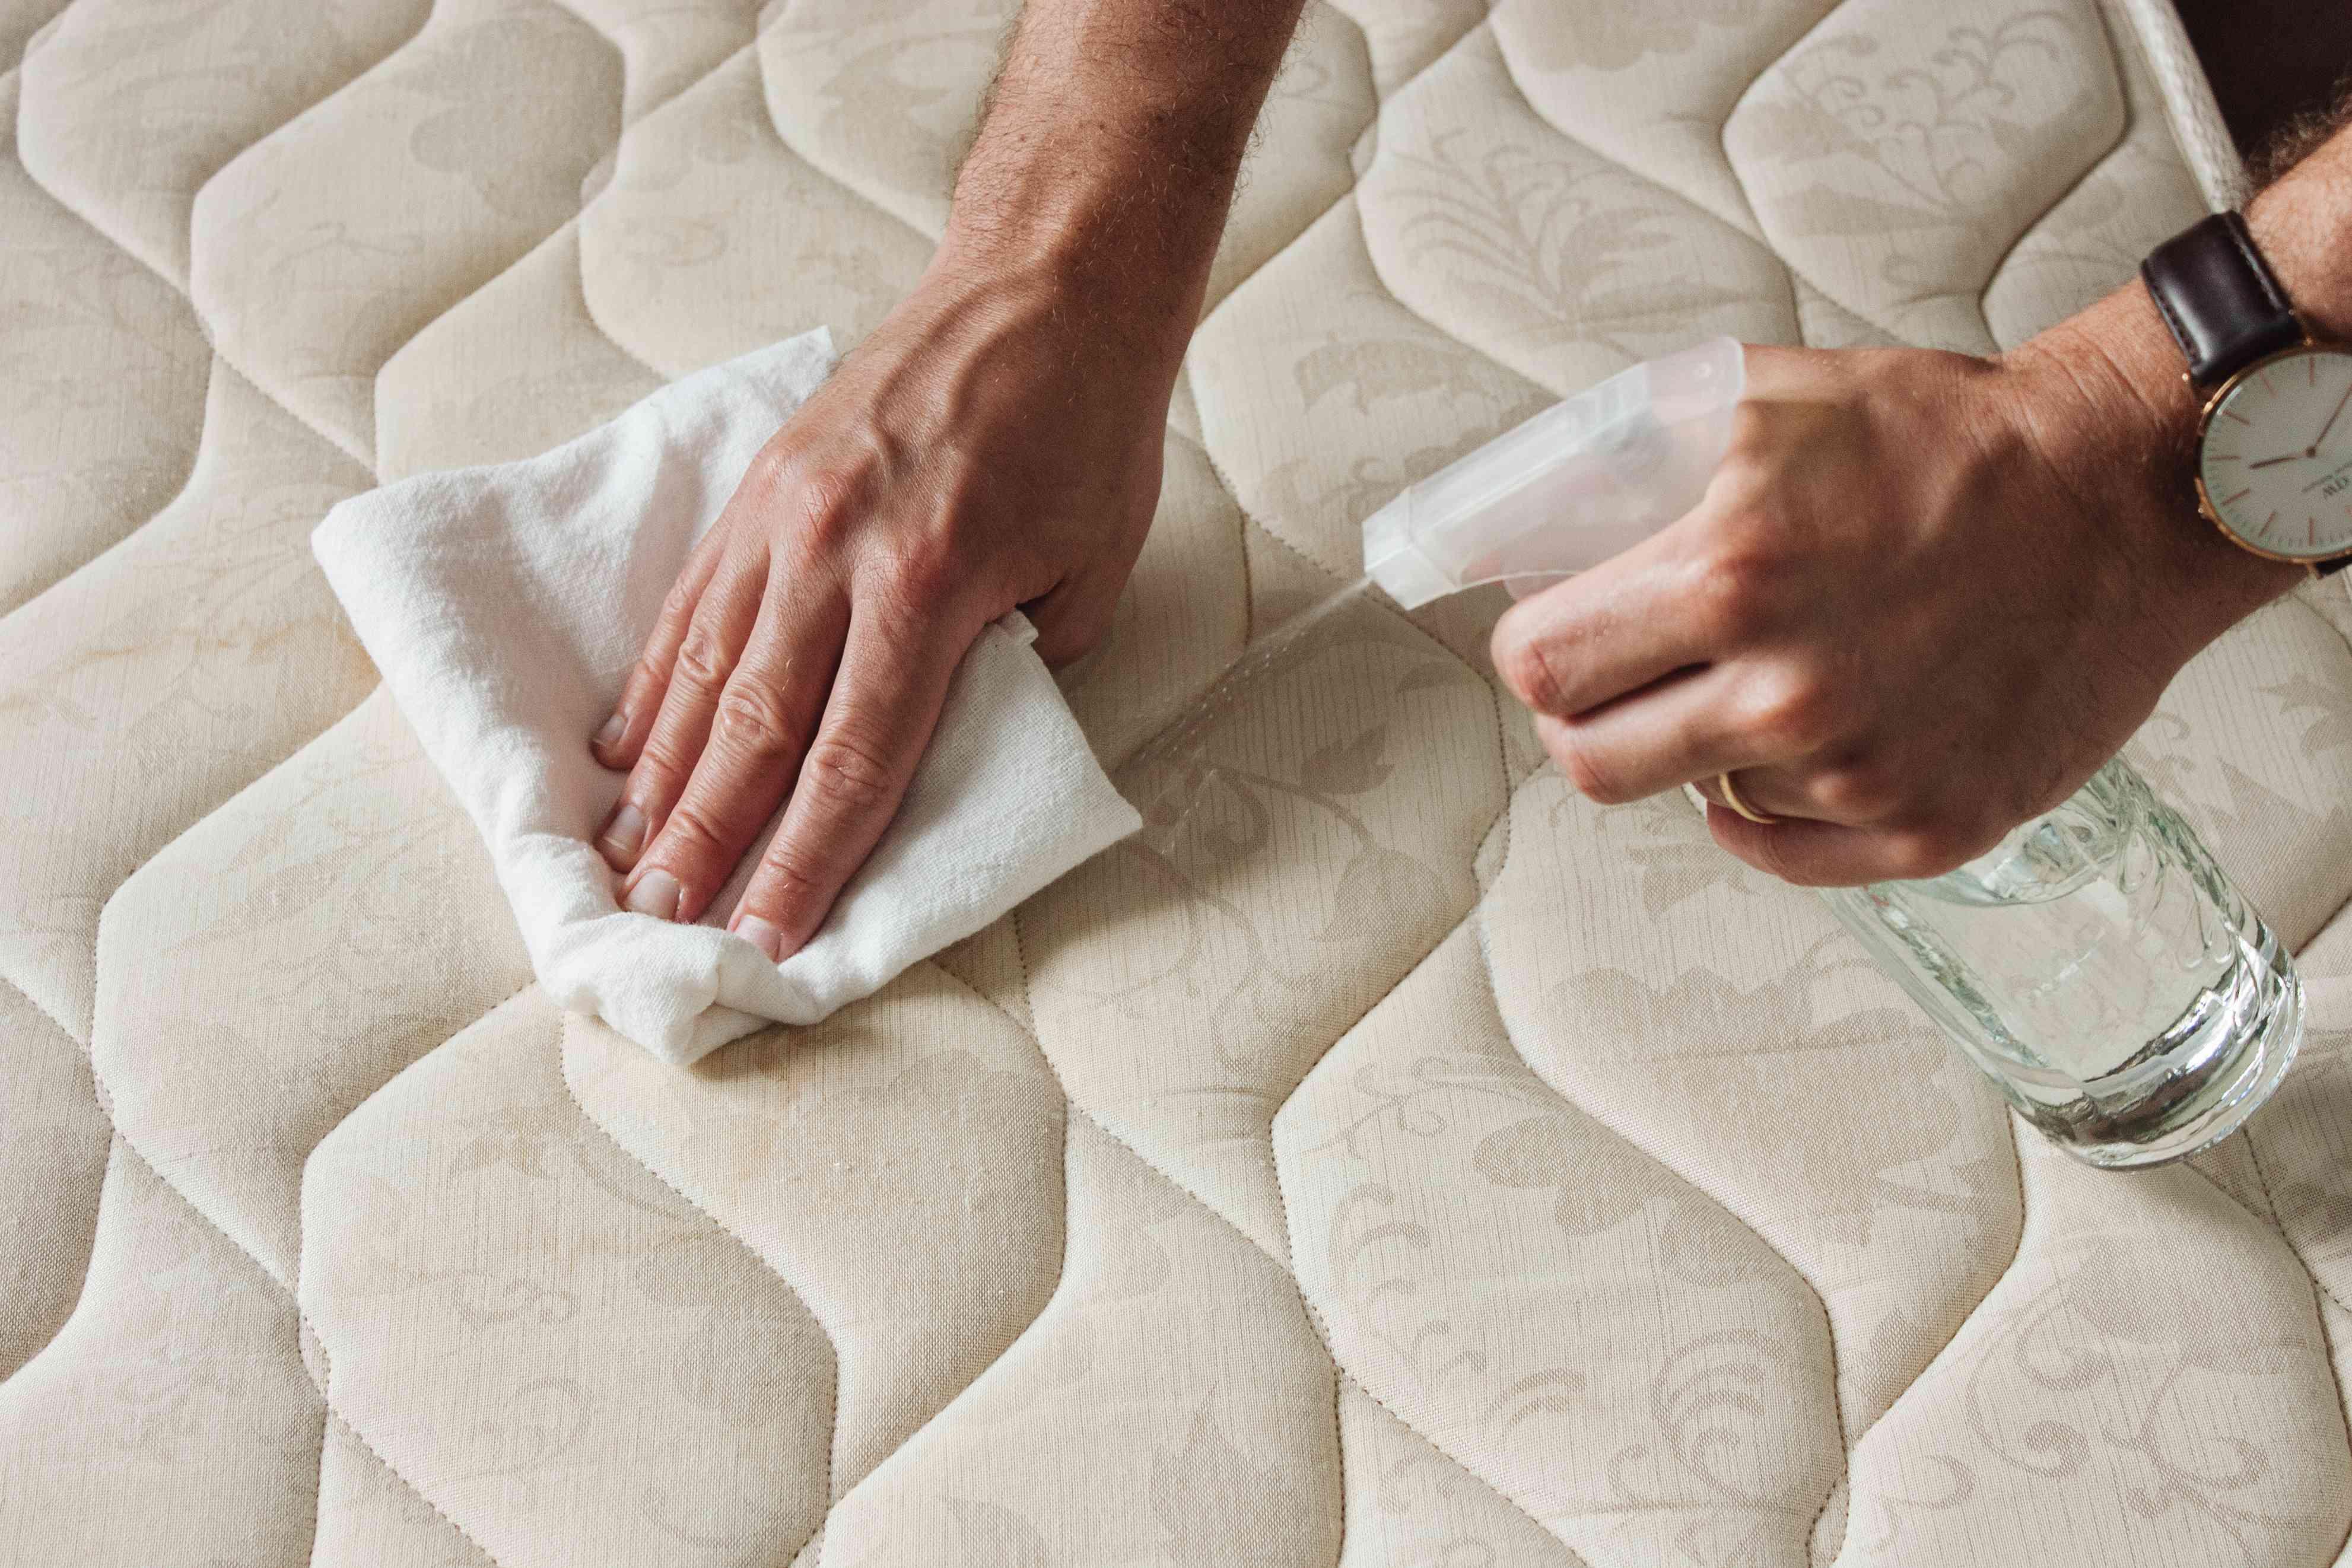 person spraying a mattress